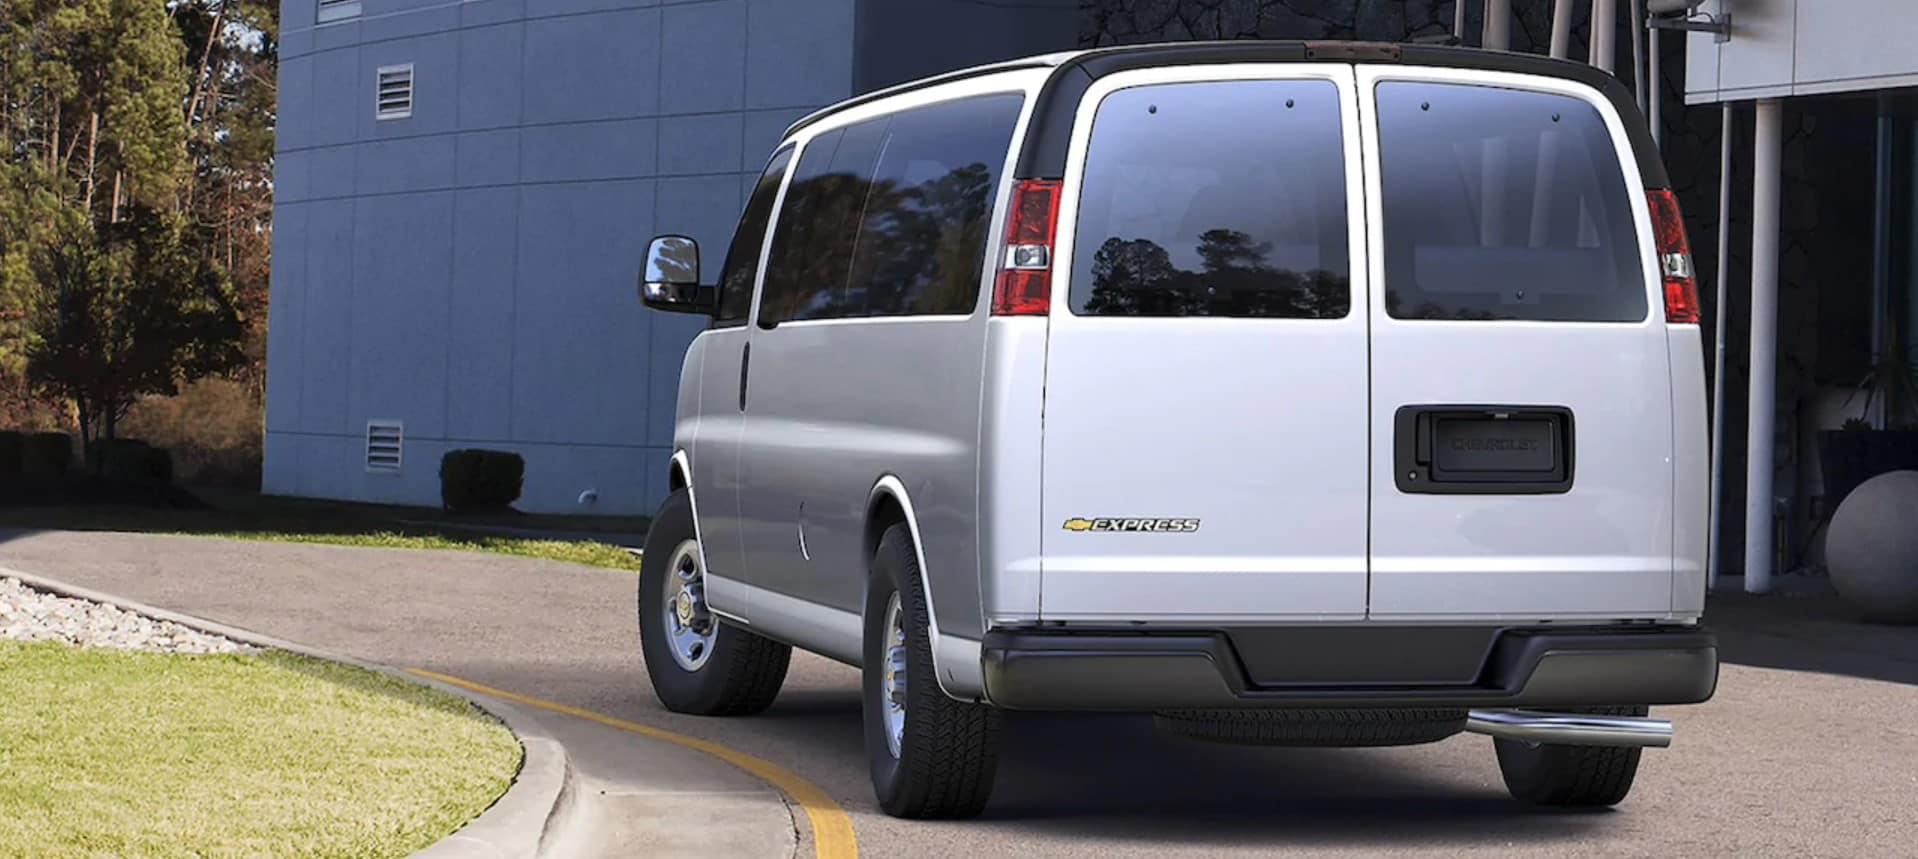 2021 Chevrolet Express Cargo Van near me